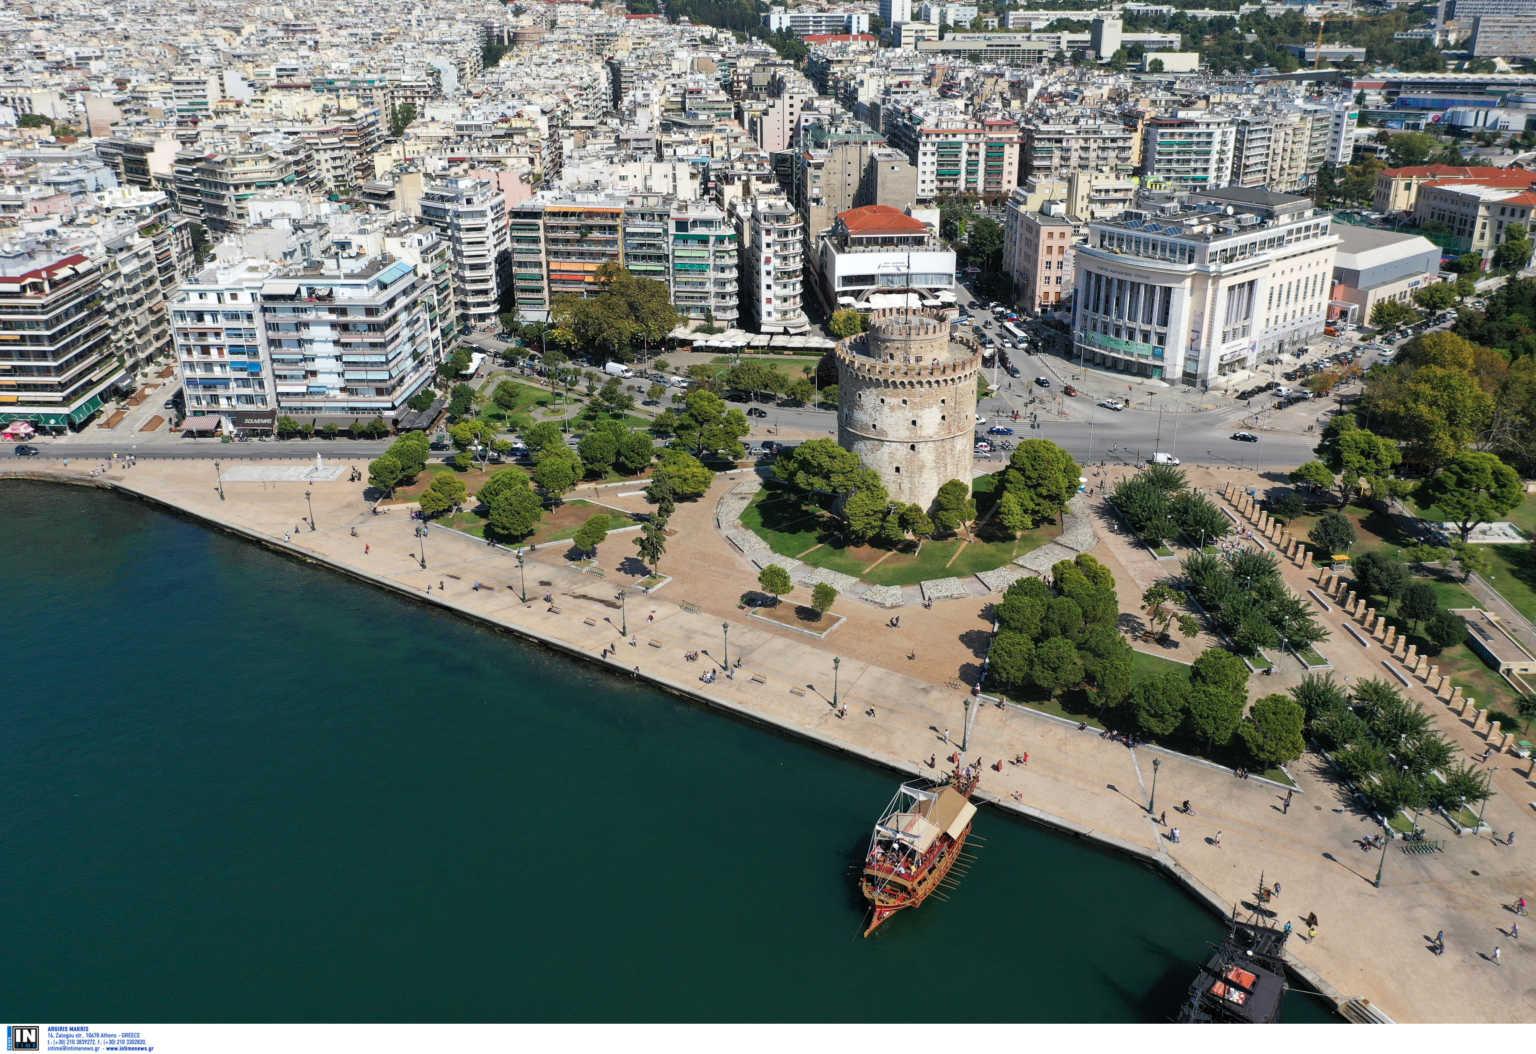 Lockdown σε Θεσσαλονίκη και Σέρρες ανακοίνωσε η κυβέρνηση